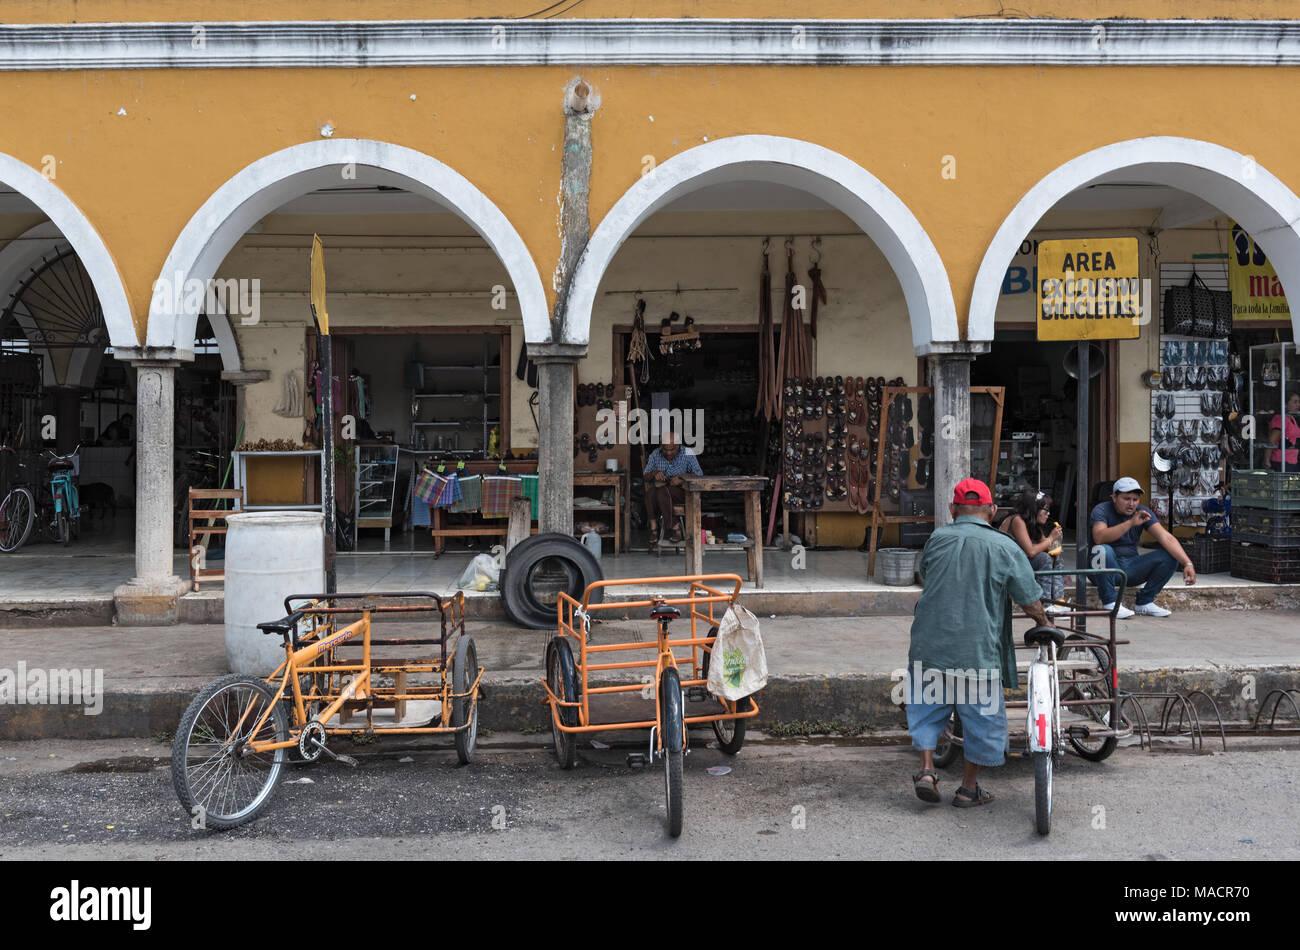 Facade of the Main Market, Mercado Municipal in Valladolid Mexico - Stock Image